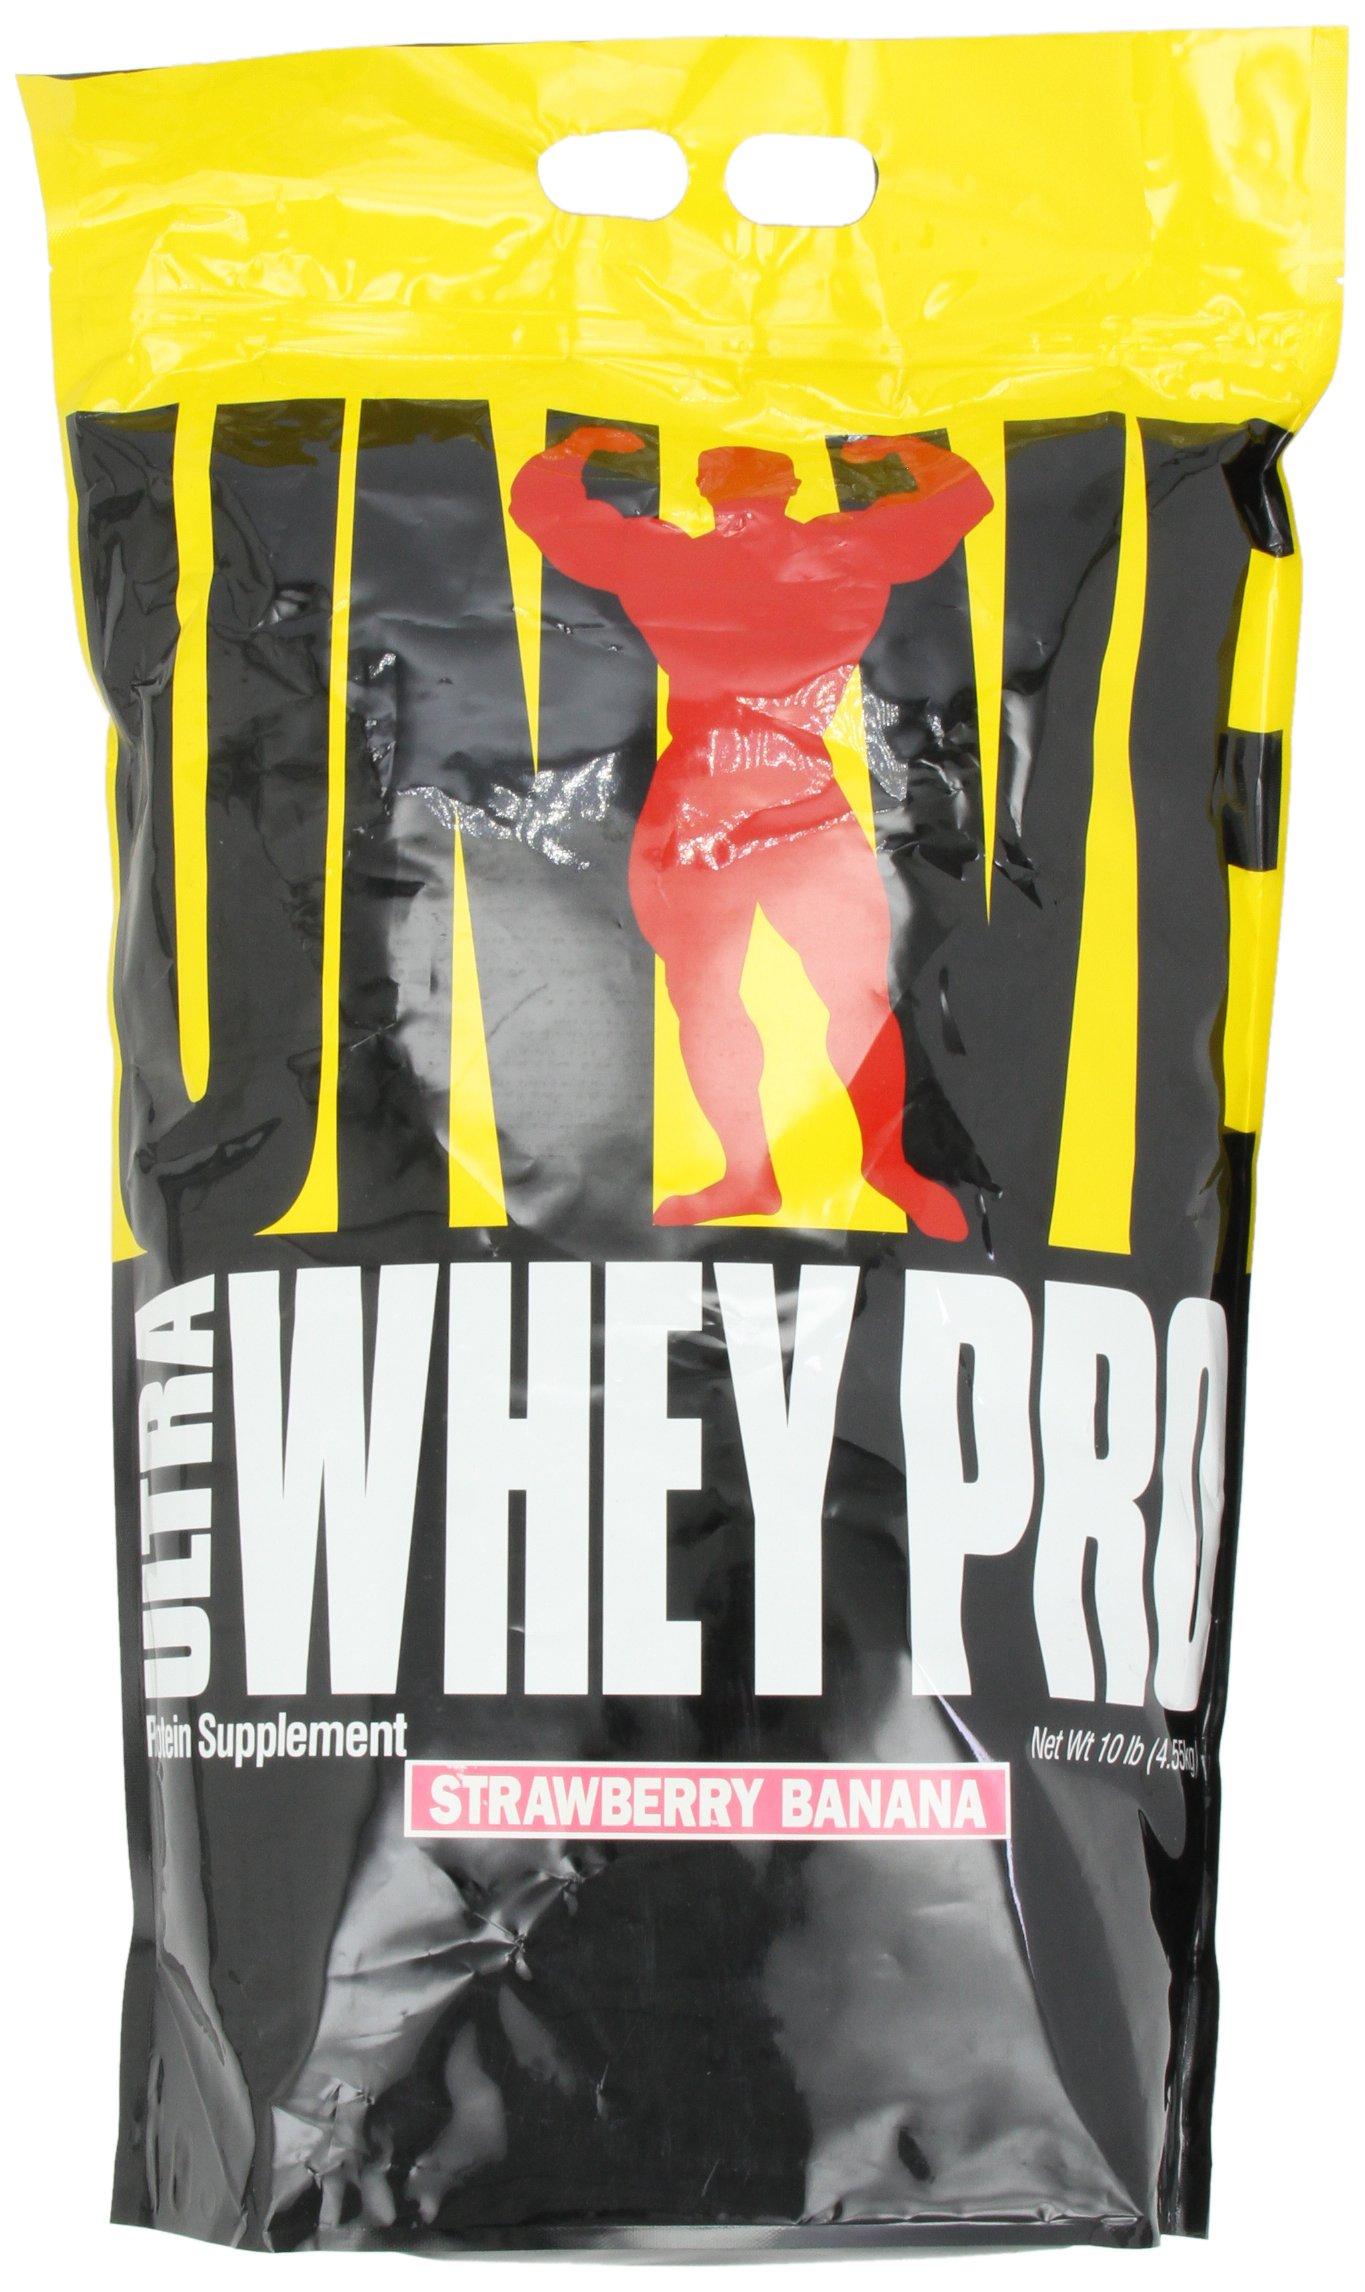 Universal Nutrition Ultra Whey Pro, Strawberry Banana, 10-Pounds by Universal Nutrition